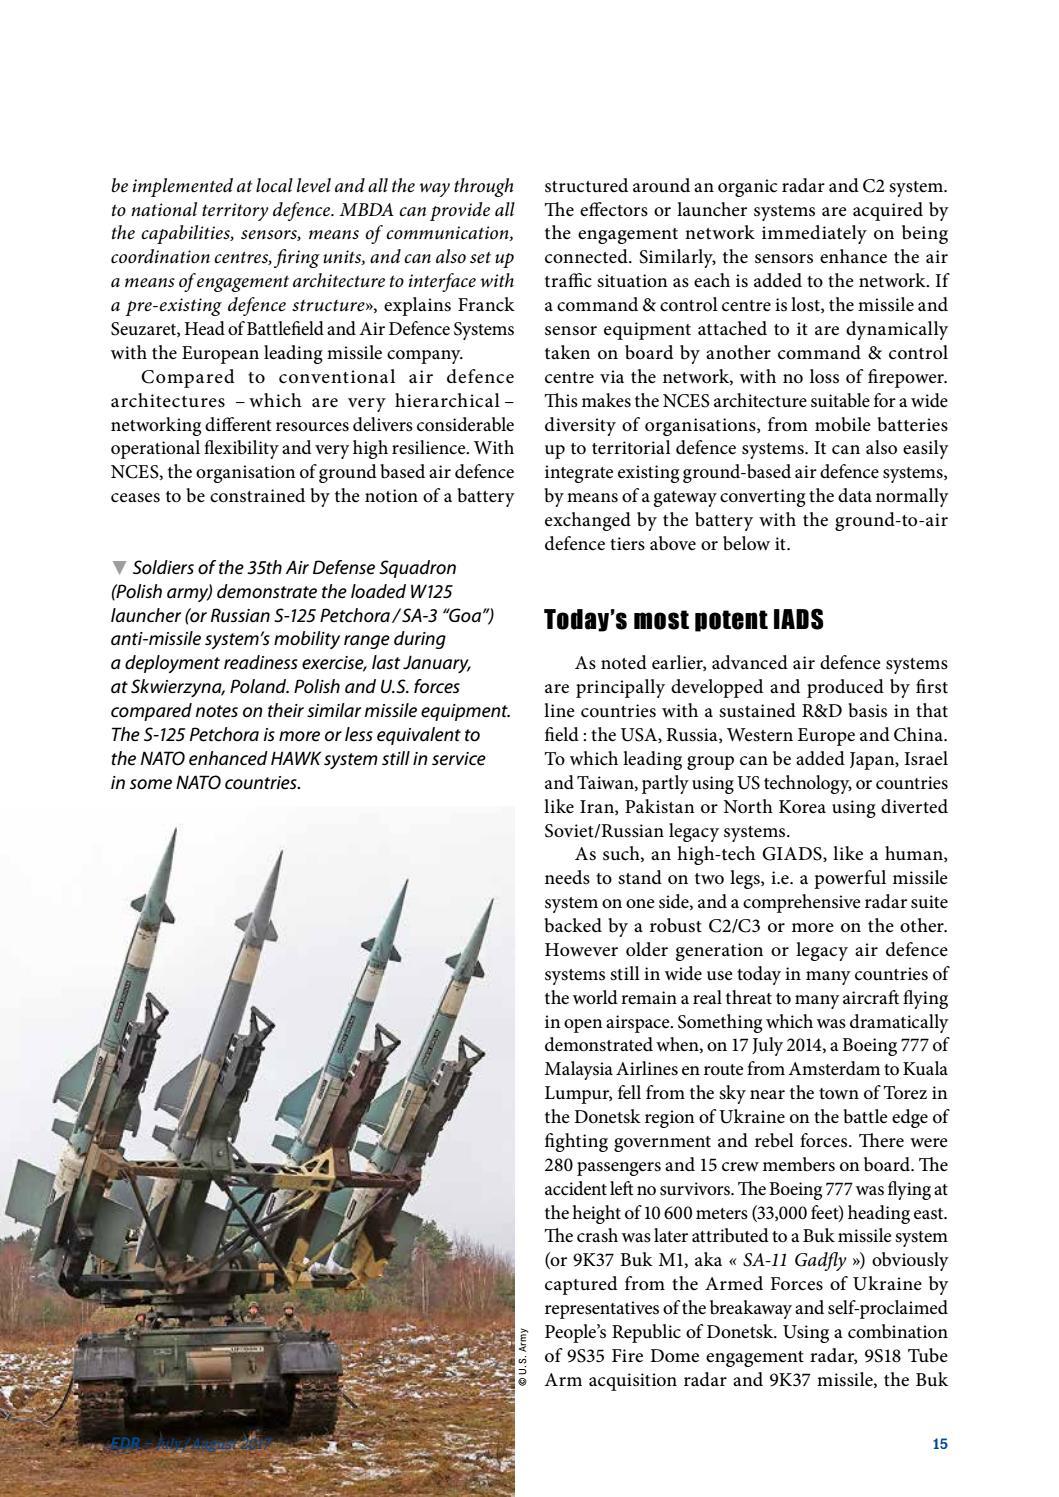 EDR Magazine issue 34 by La Passion Artistique - issuu